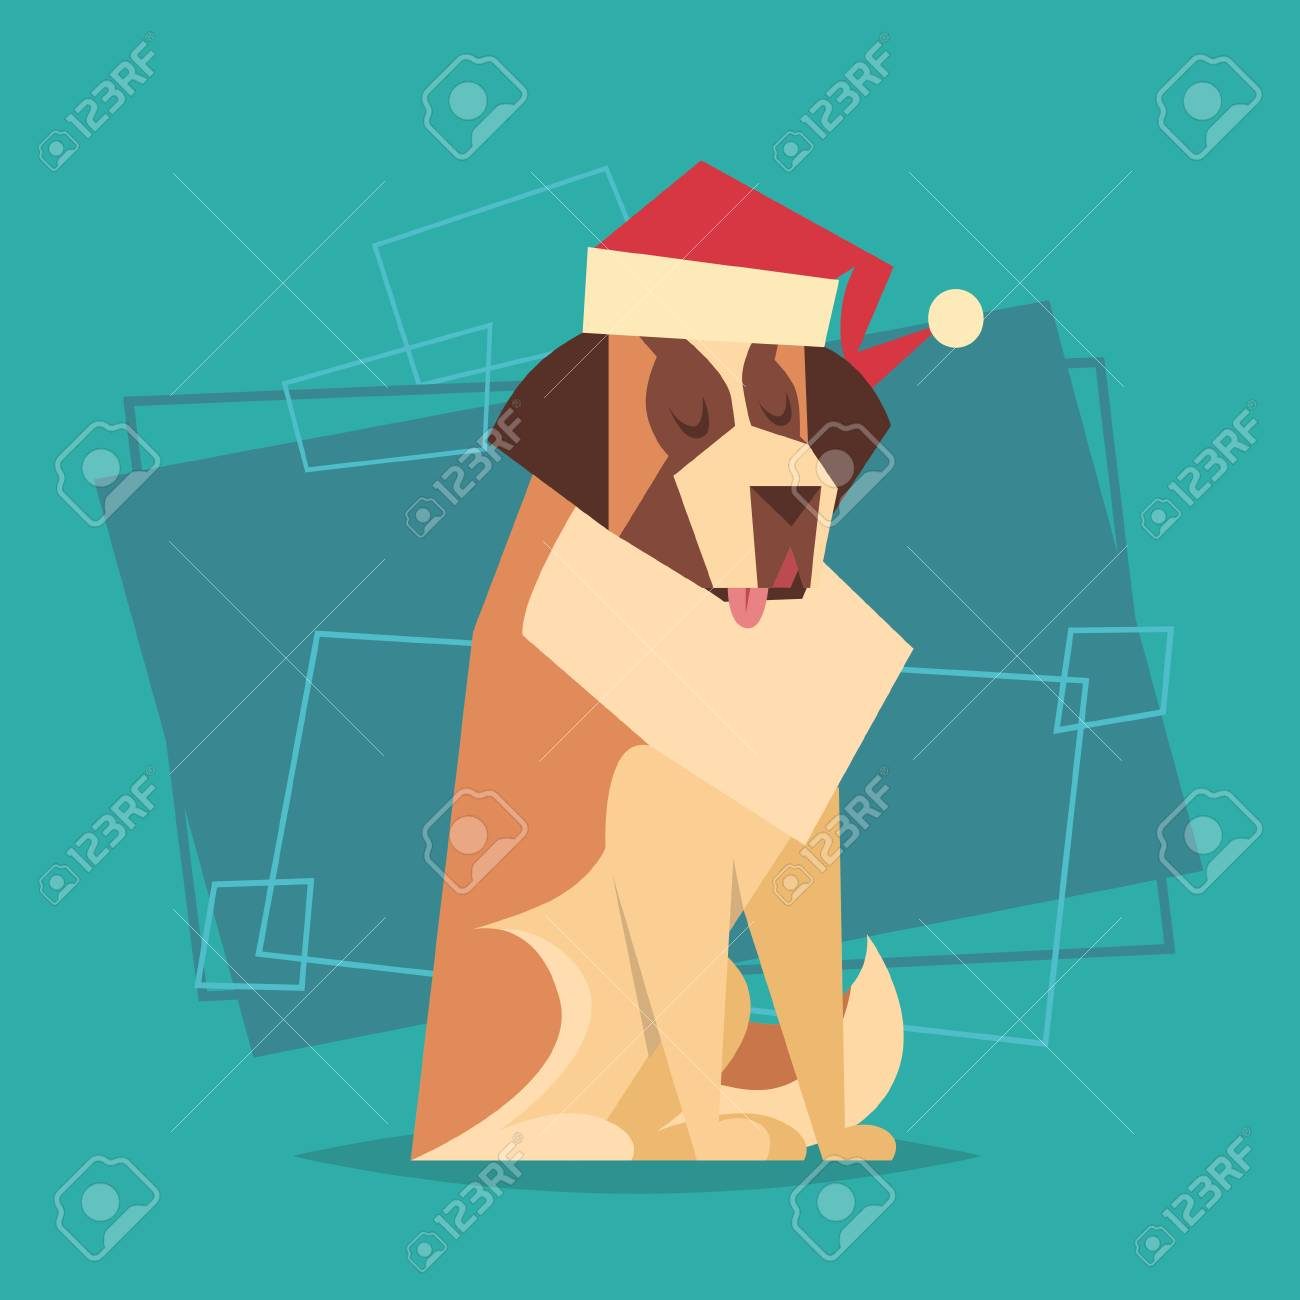 Dog wear santa hat happy new year 2018 zodiac symbol icon flat dog wear santa hat happy new year 2018 zodiac symbol icon flat vector illustration stock vector buycottarizona Image collections